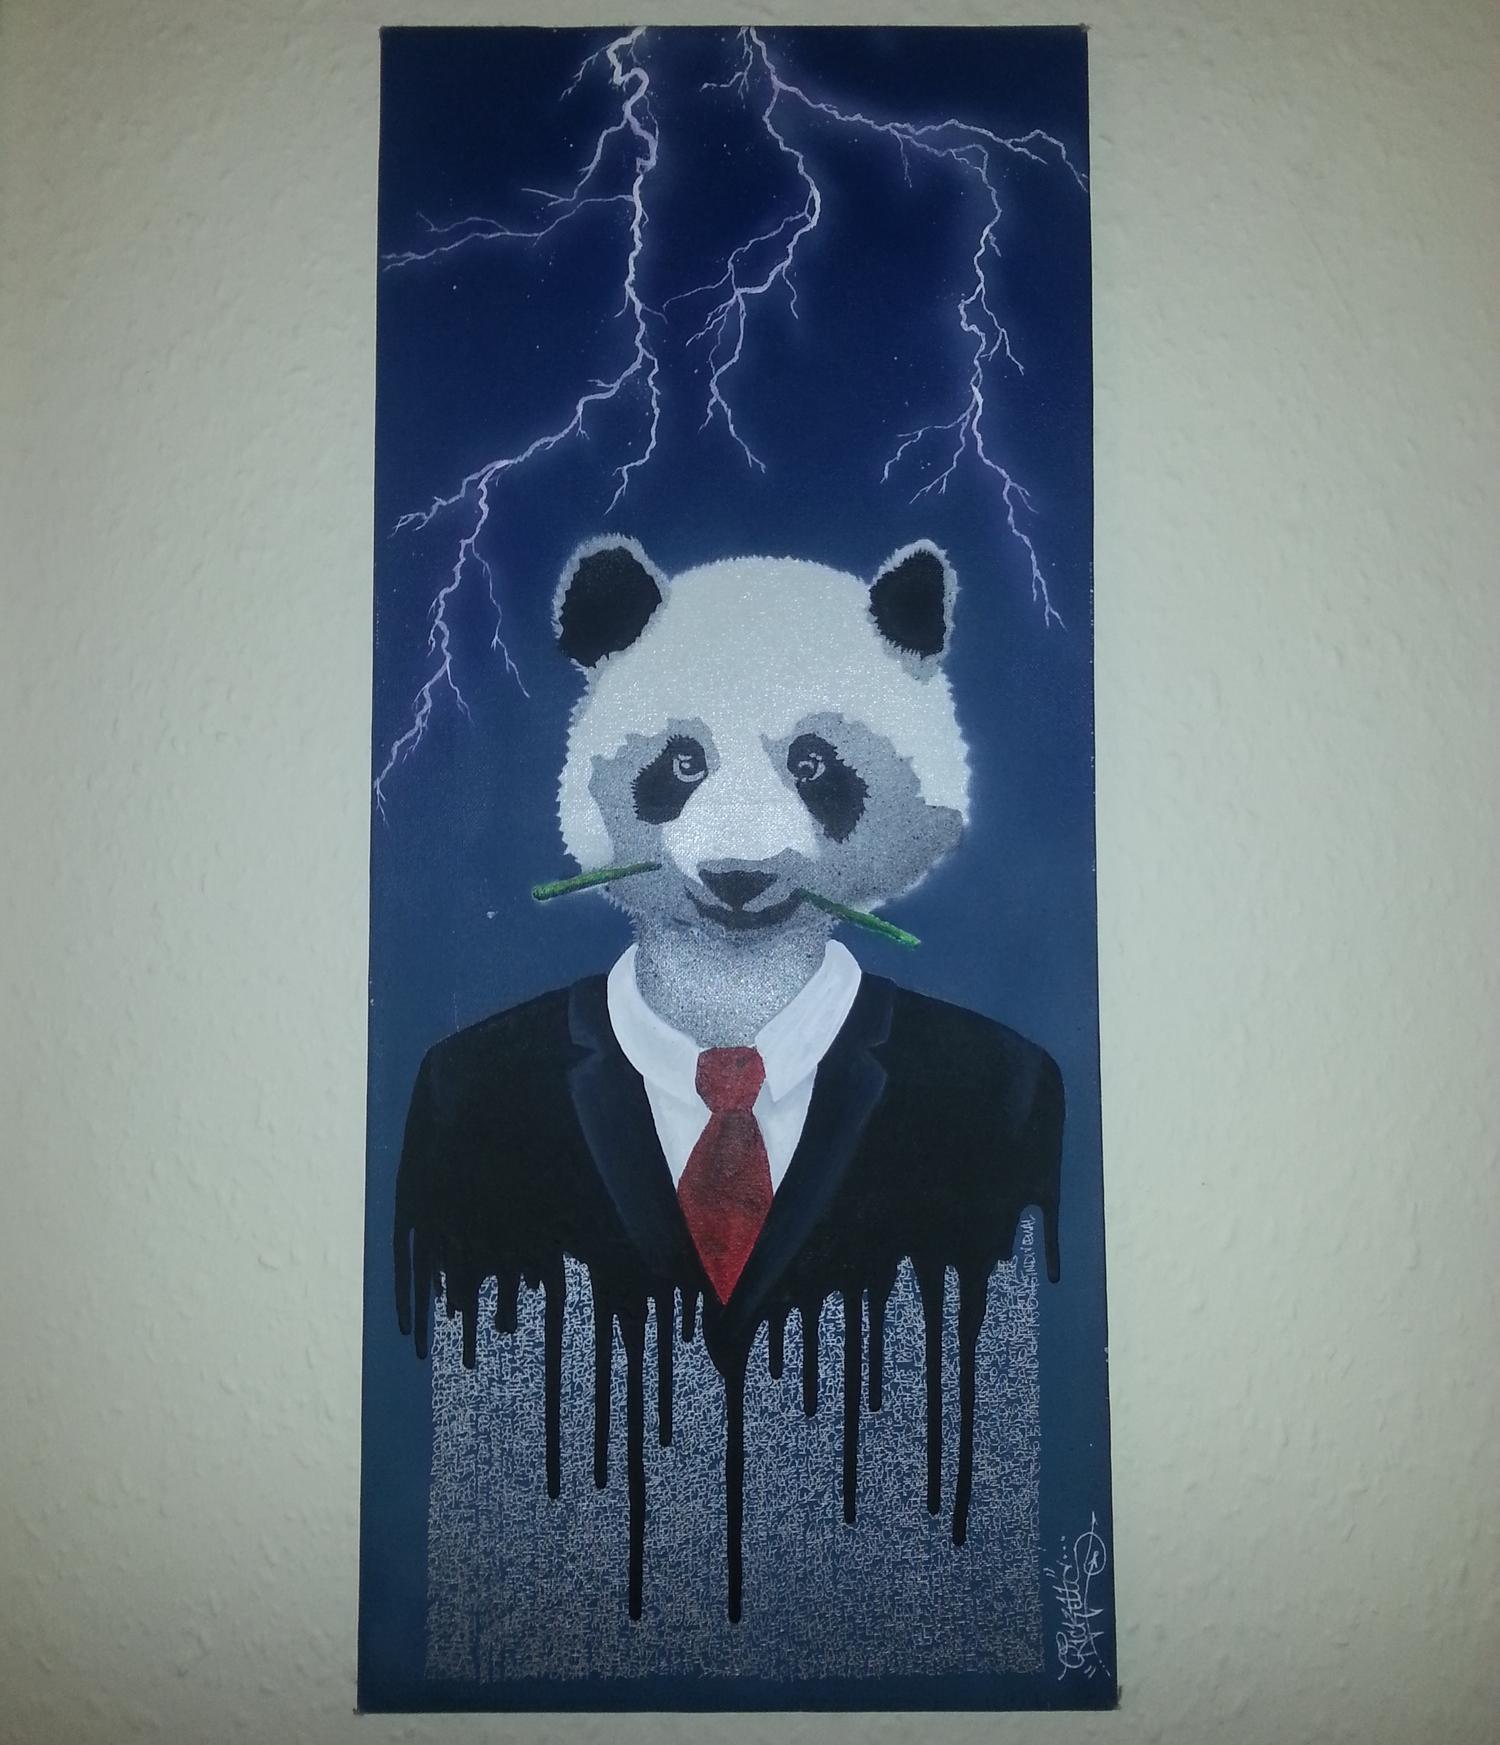 Panda Business (2007)